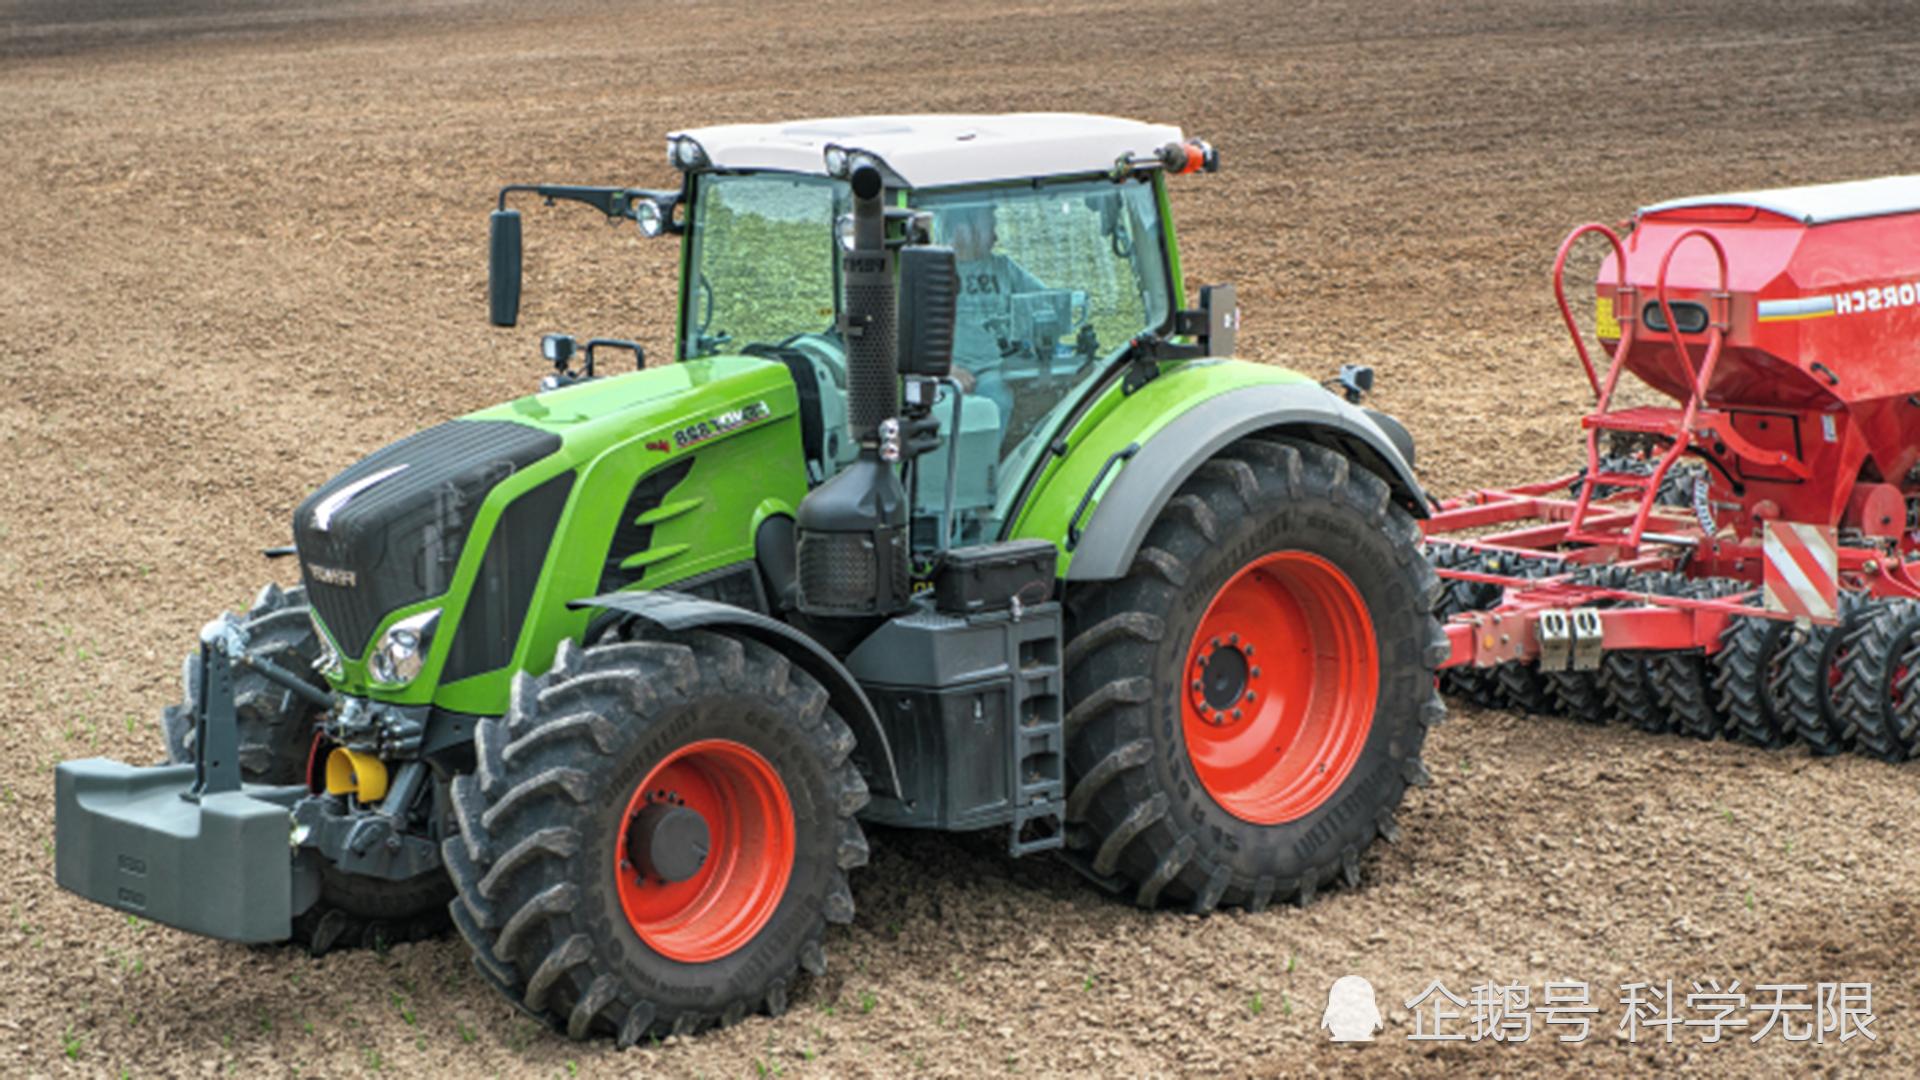 Fendt 828Vario拖拉機耕地,既能農業生產又能運輸